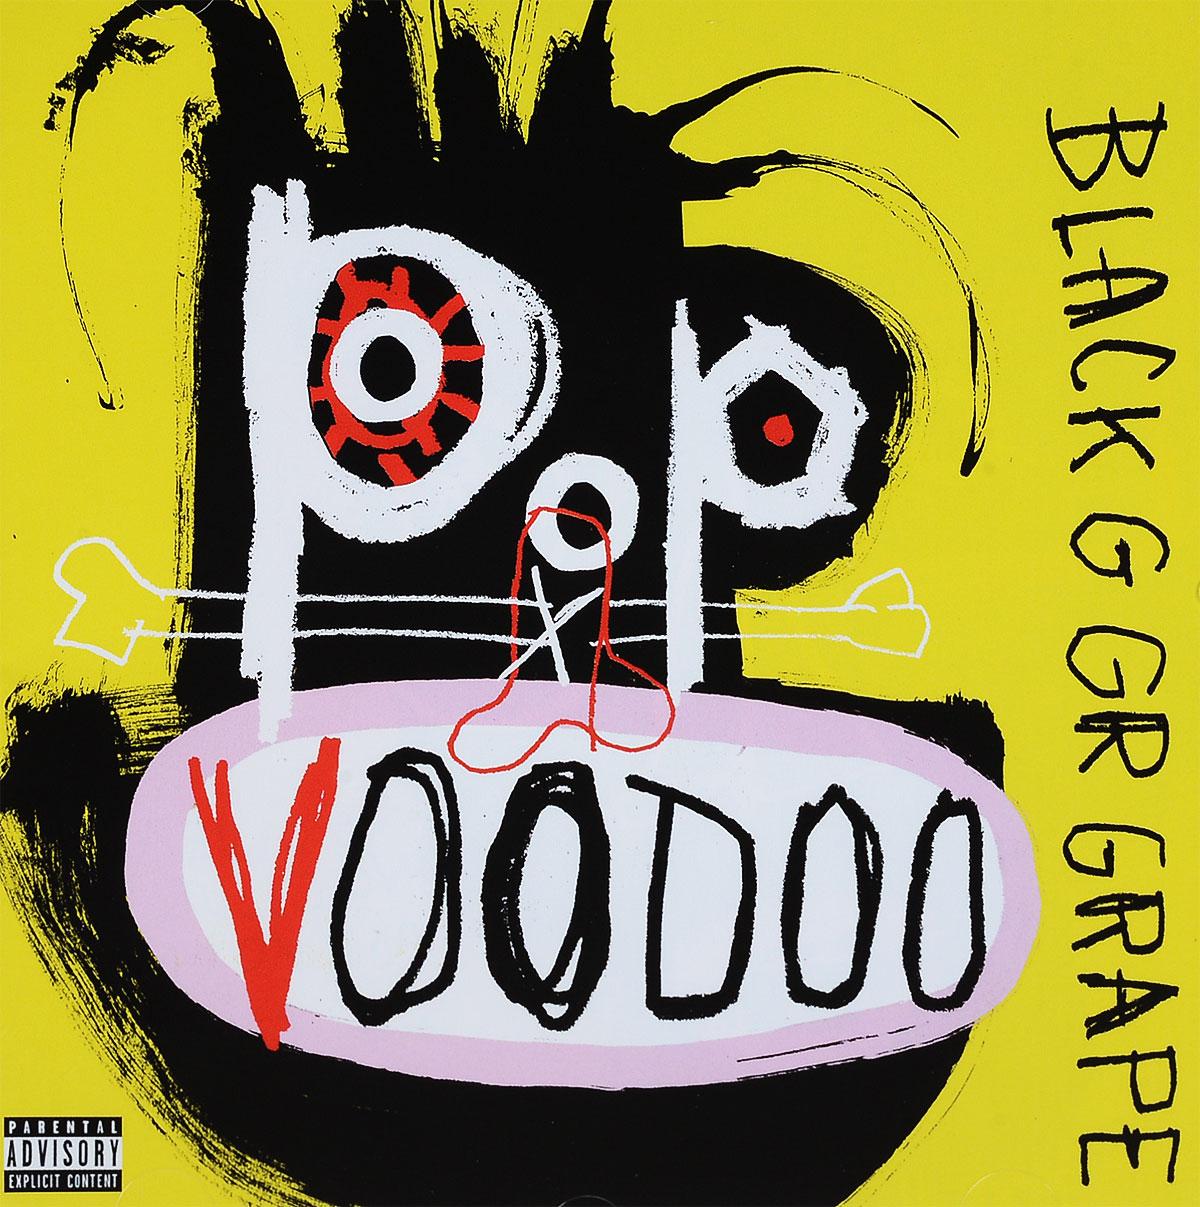 Black Grape Black Grape. Pop Voodoo manual grape pendant personality fashion popular long earrings